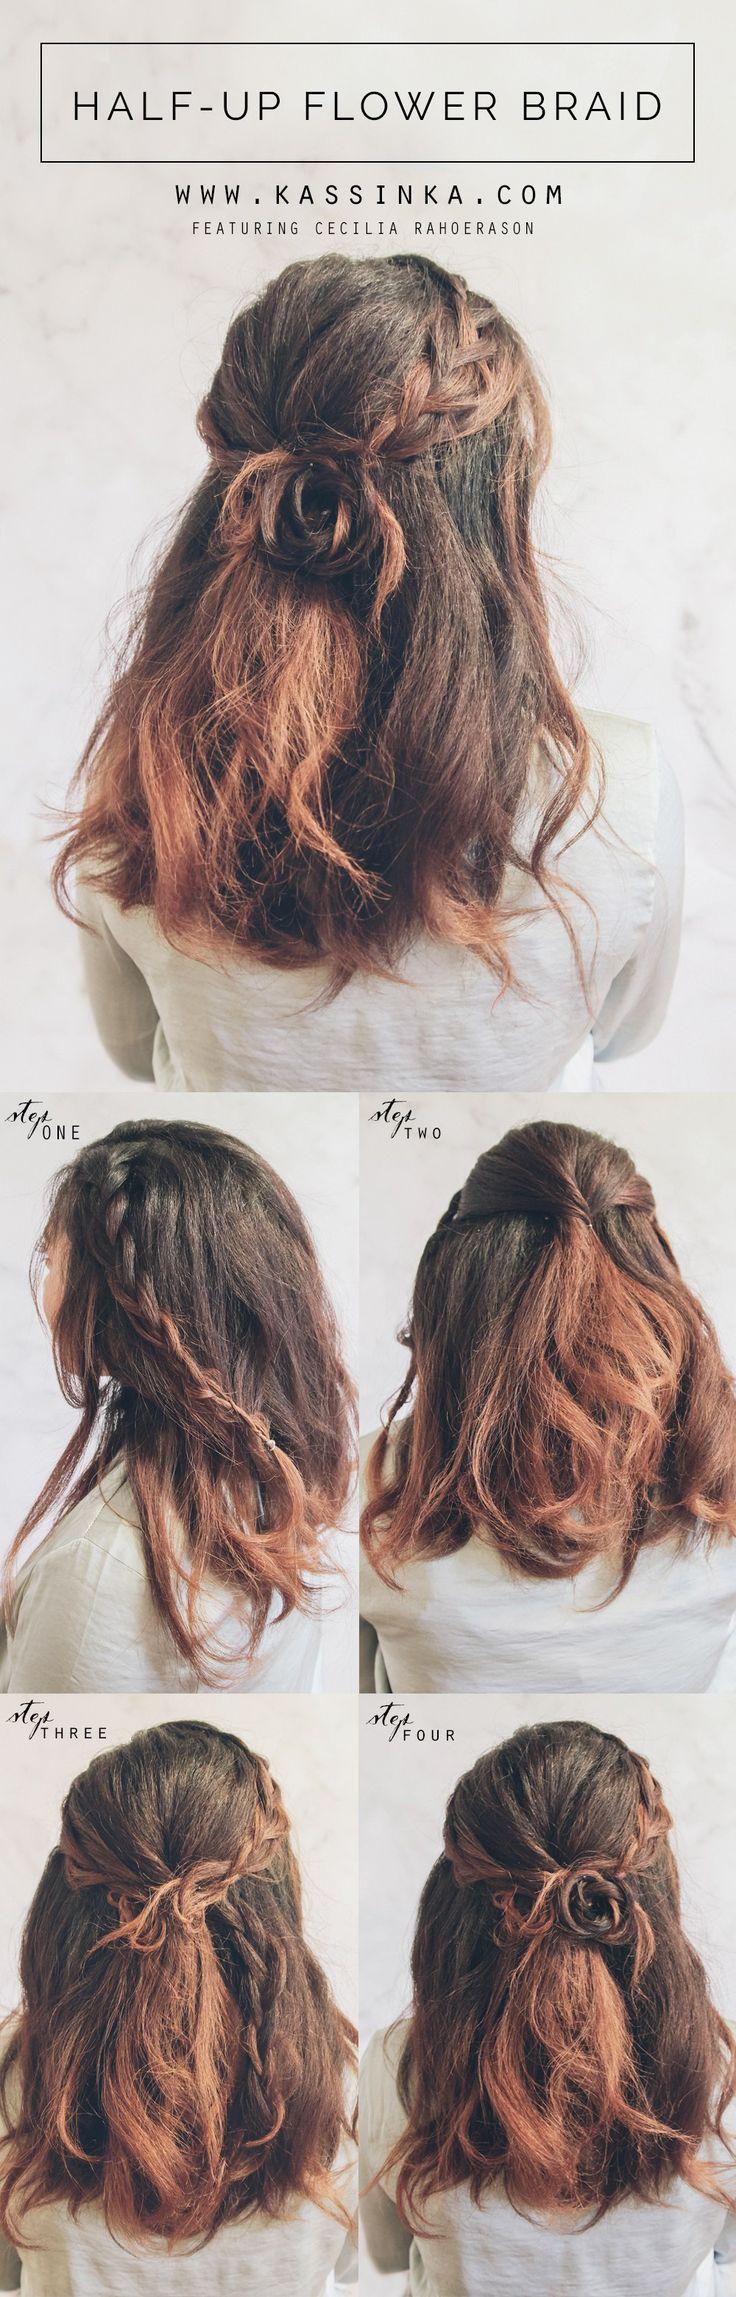 Half up Flower Braid Hair Tutorial